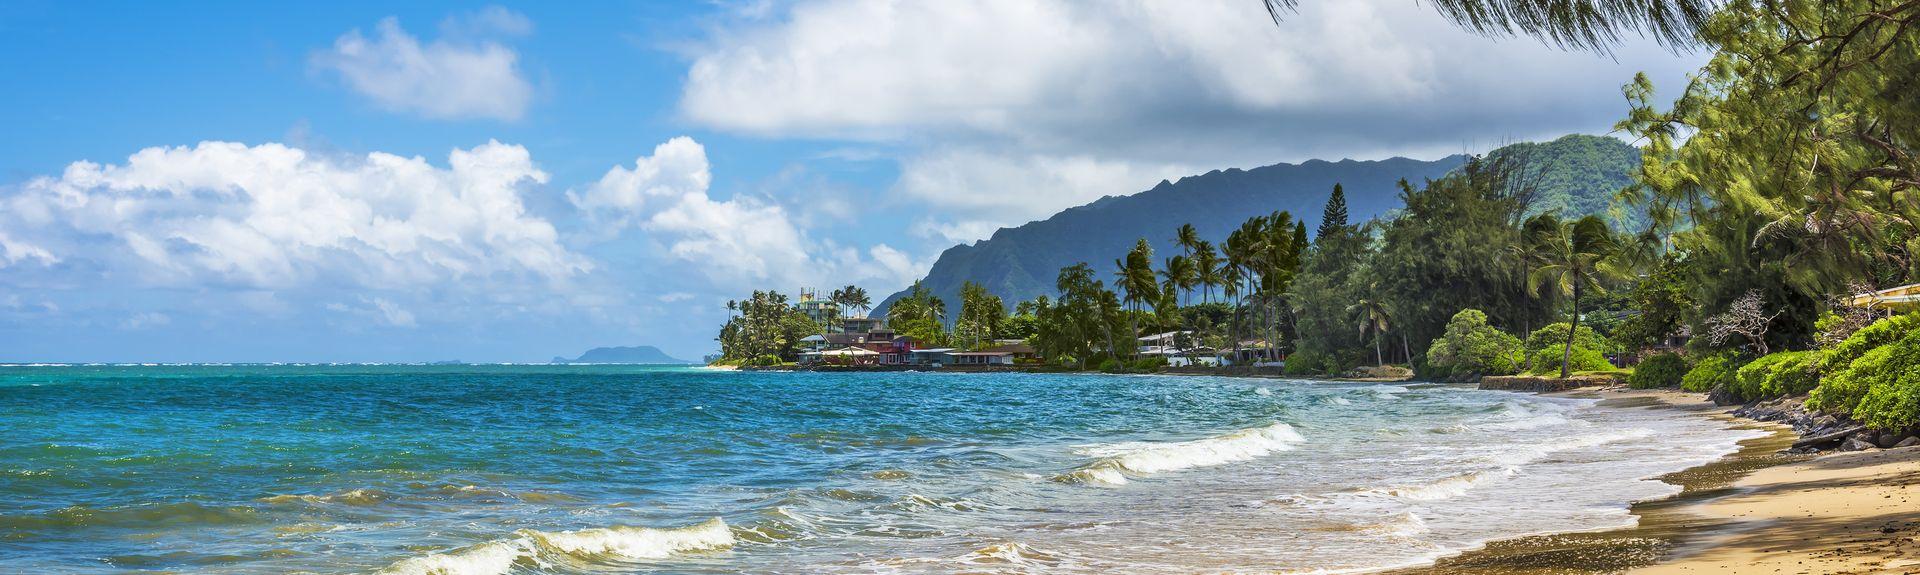 Punalu'u Beach, Pahala, Hawaii, USA